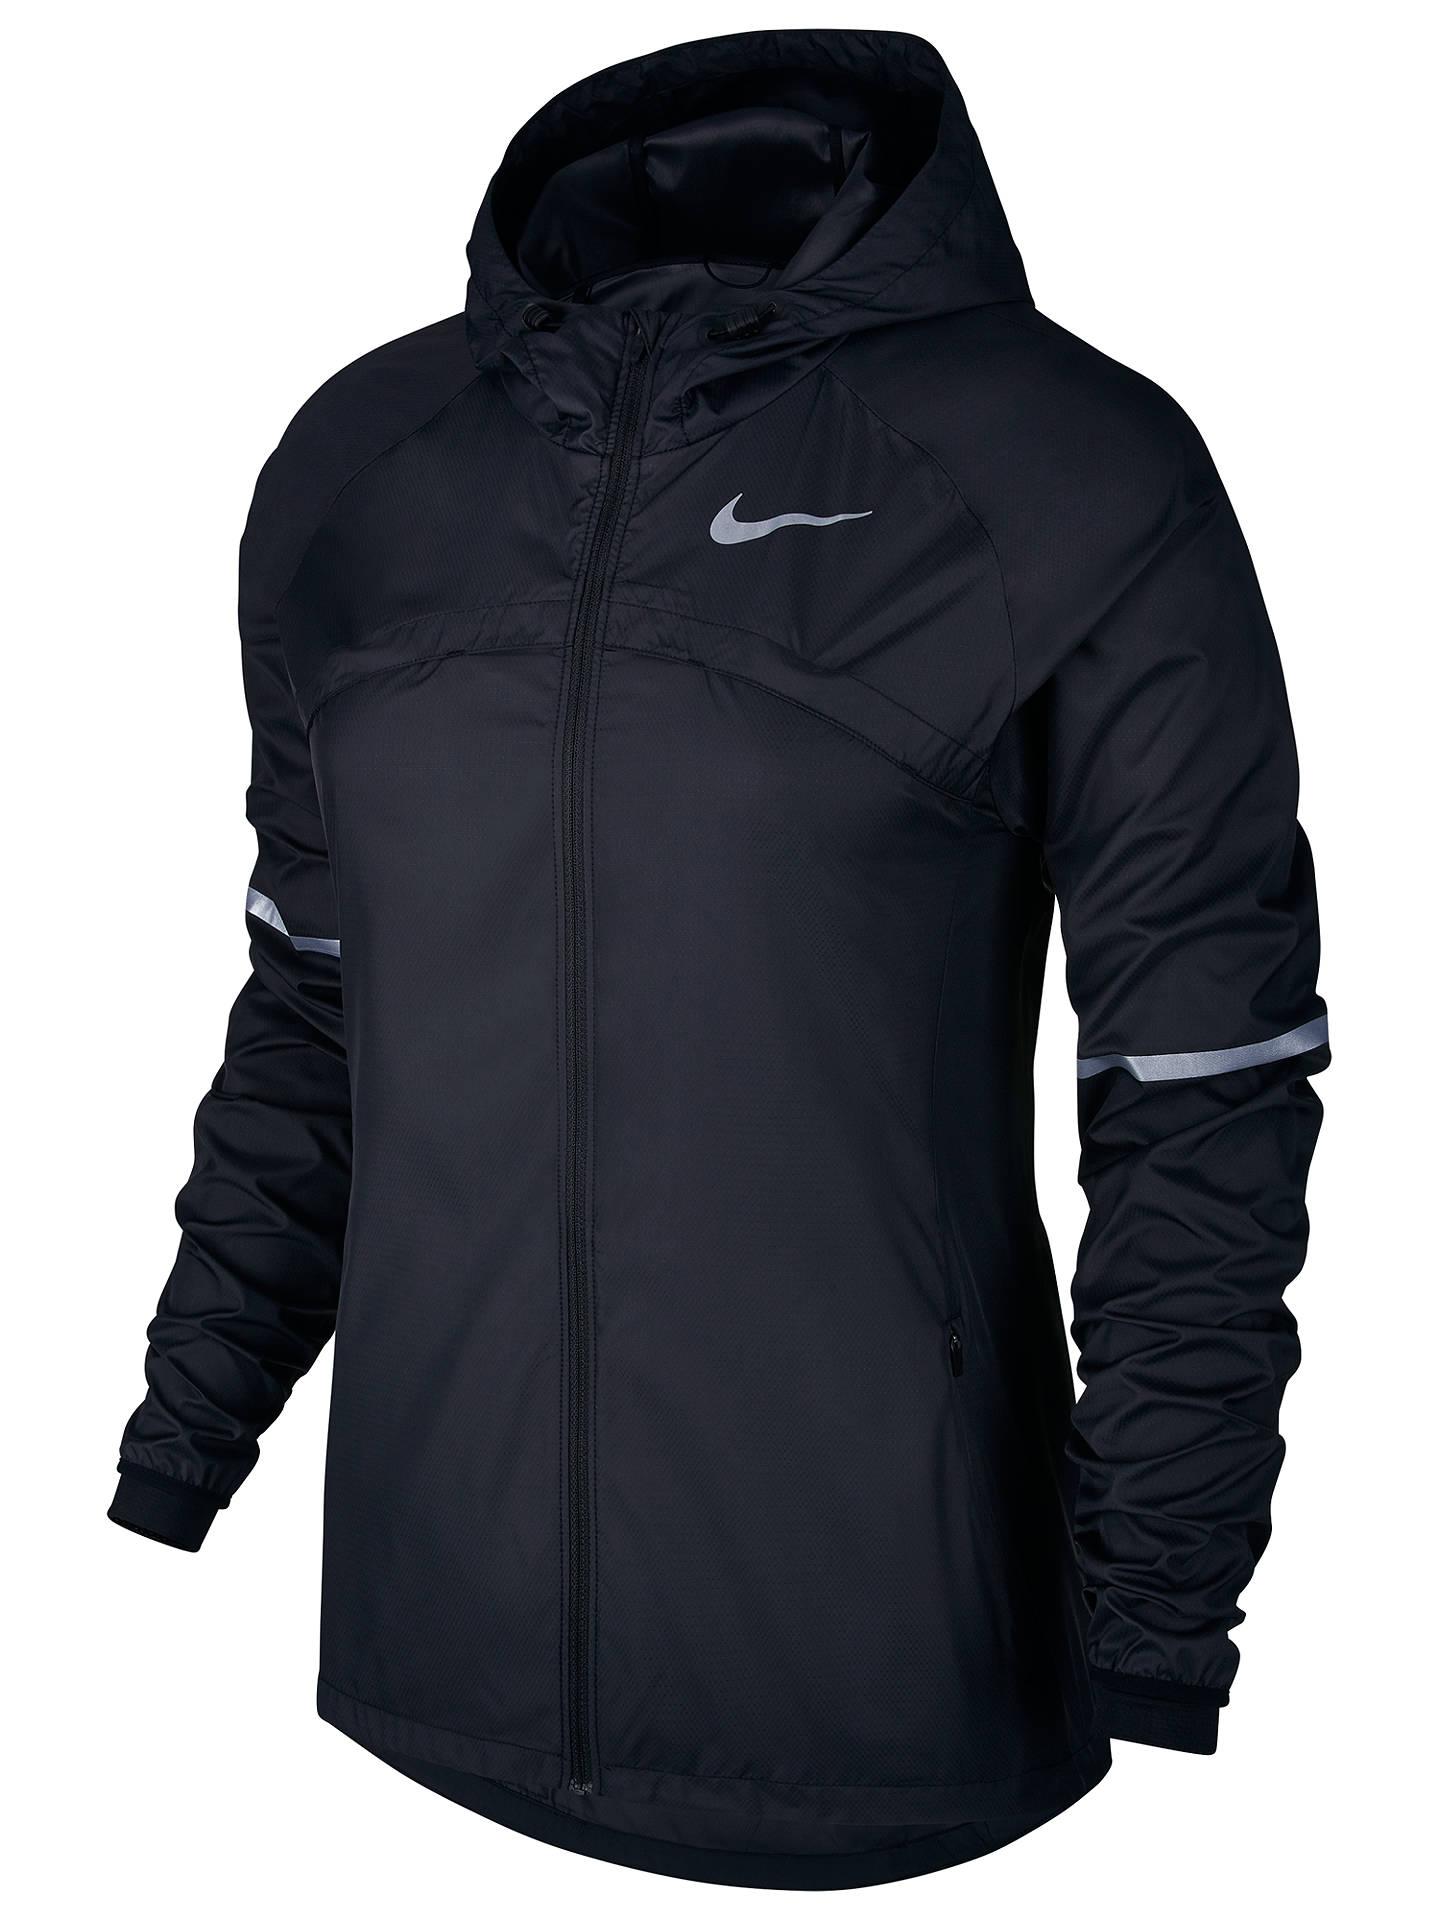 sin embargo acceso Específicamente  Nike Shield Hooded Women's Running Jacket, Black at John Lewis & Partners